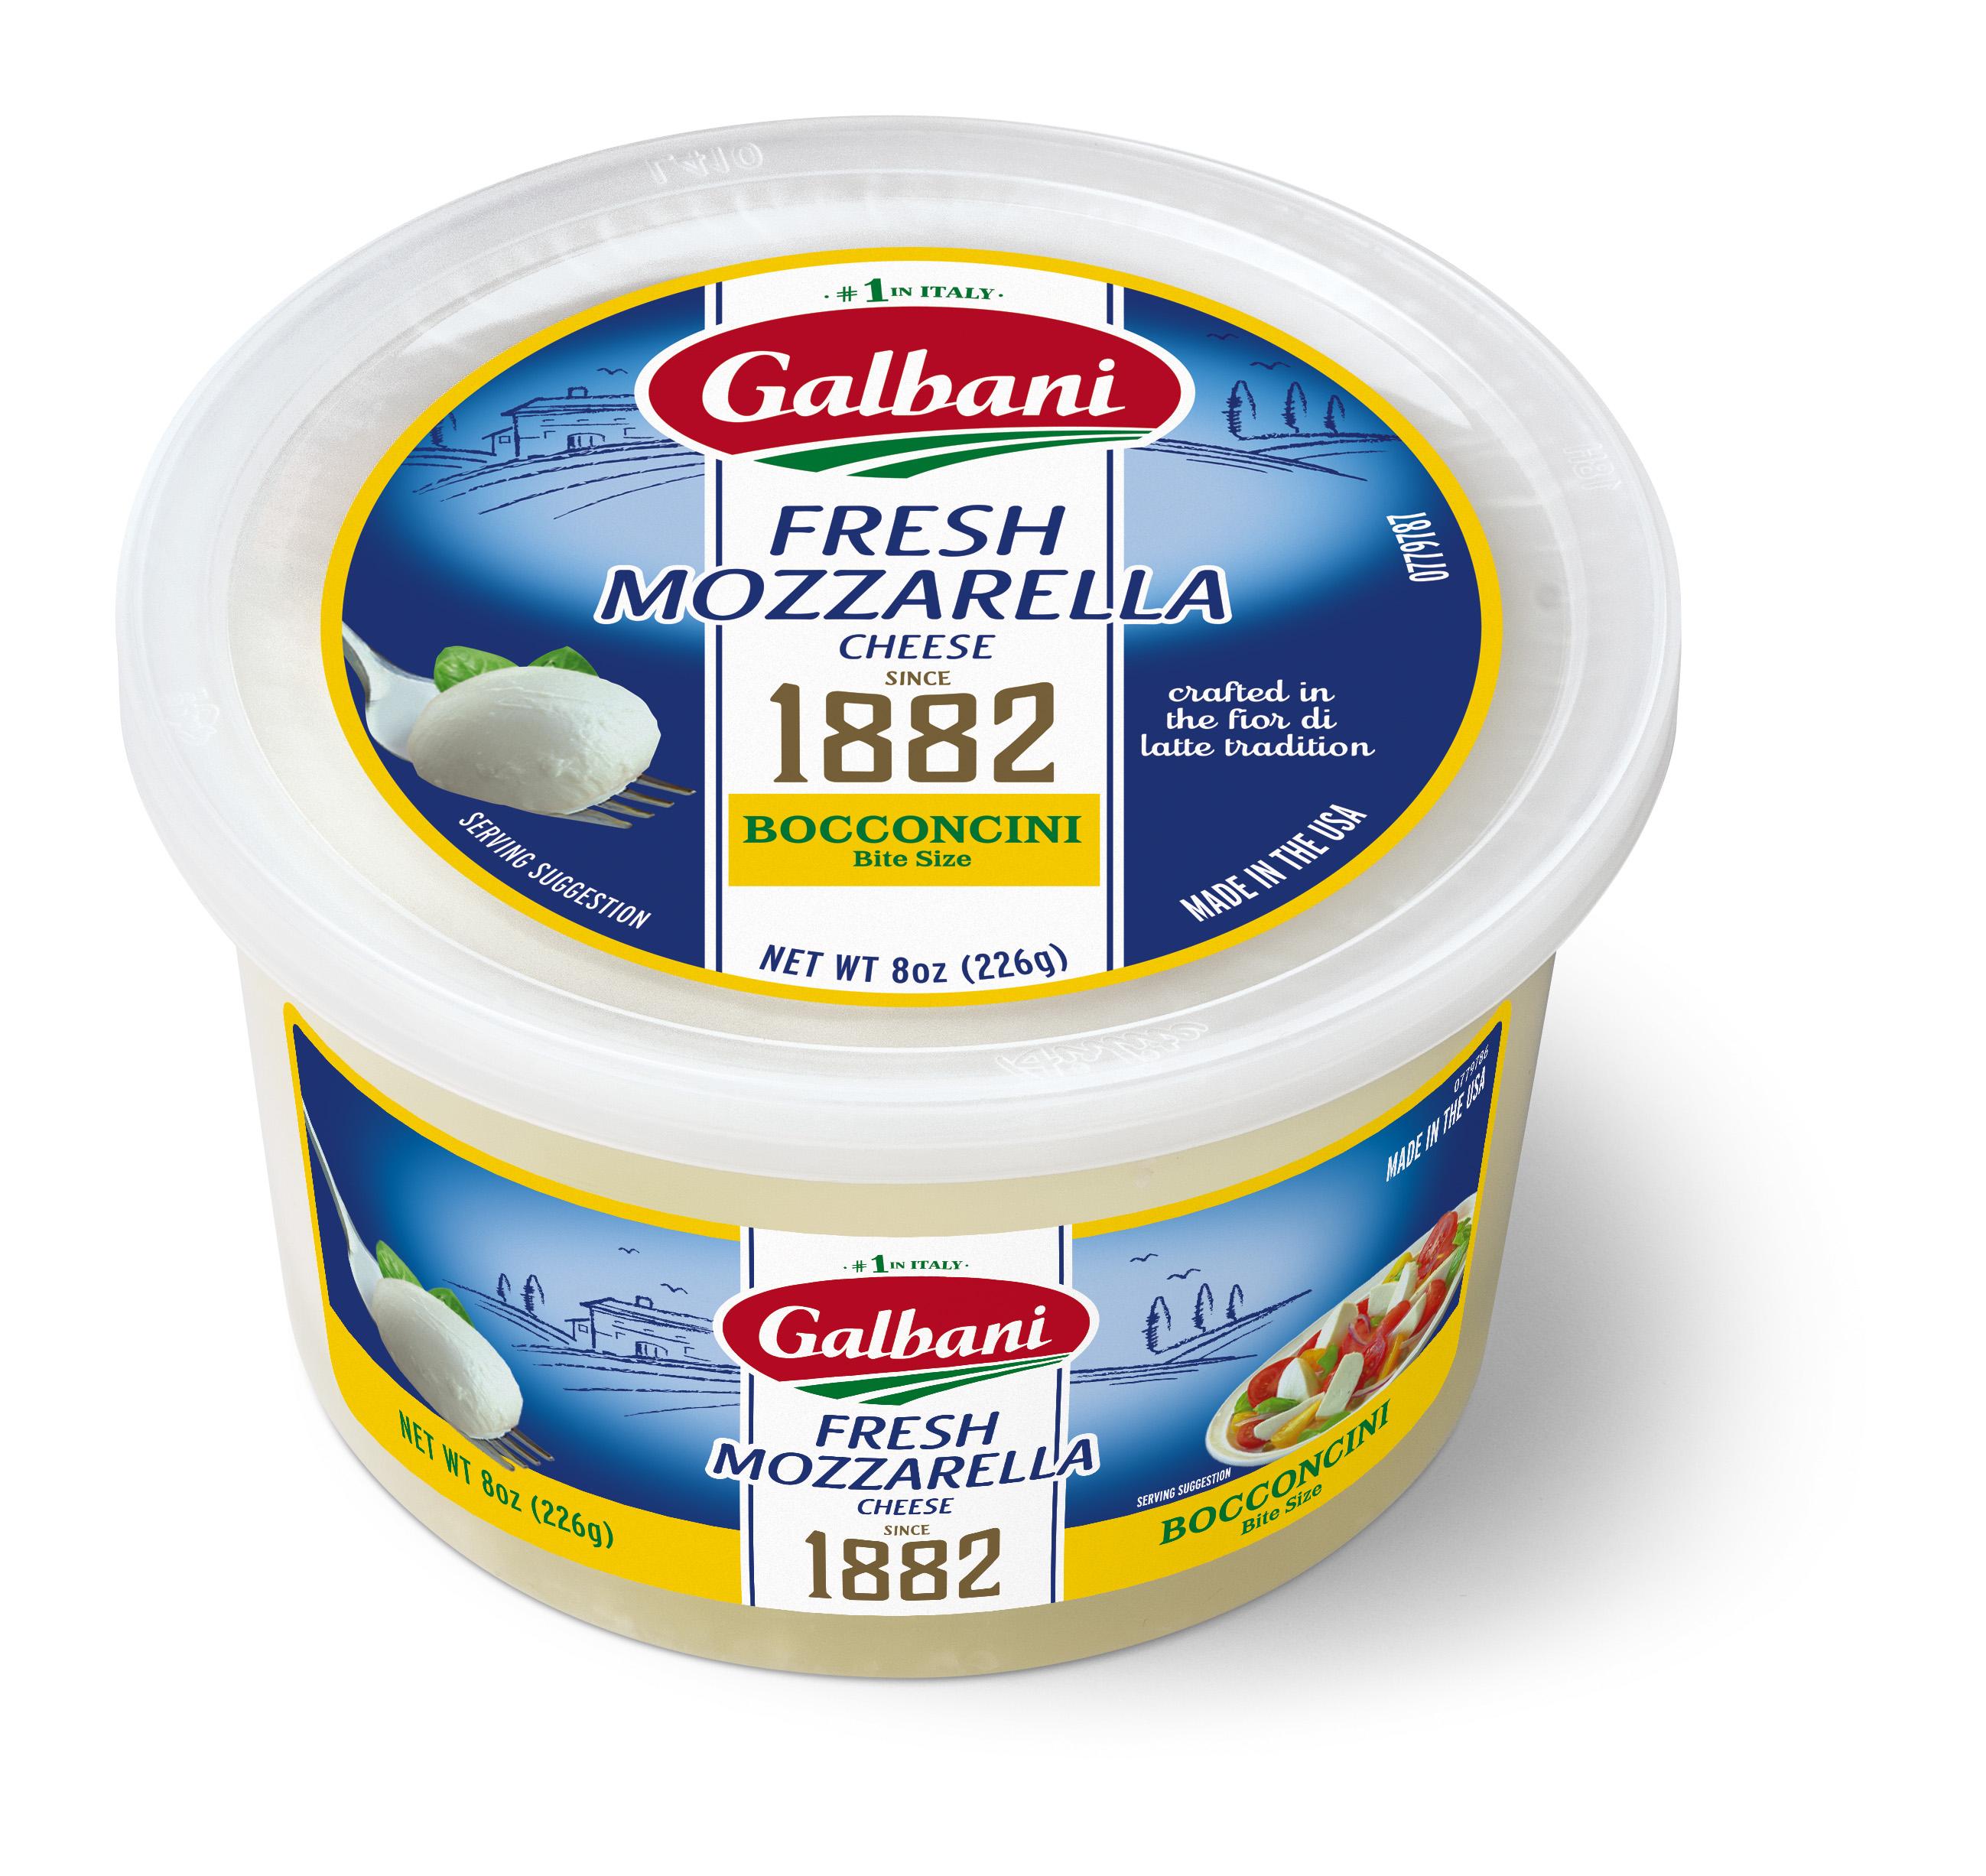 Fresh Mozzarella Bocconcini - Galbani Cheese